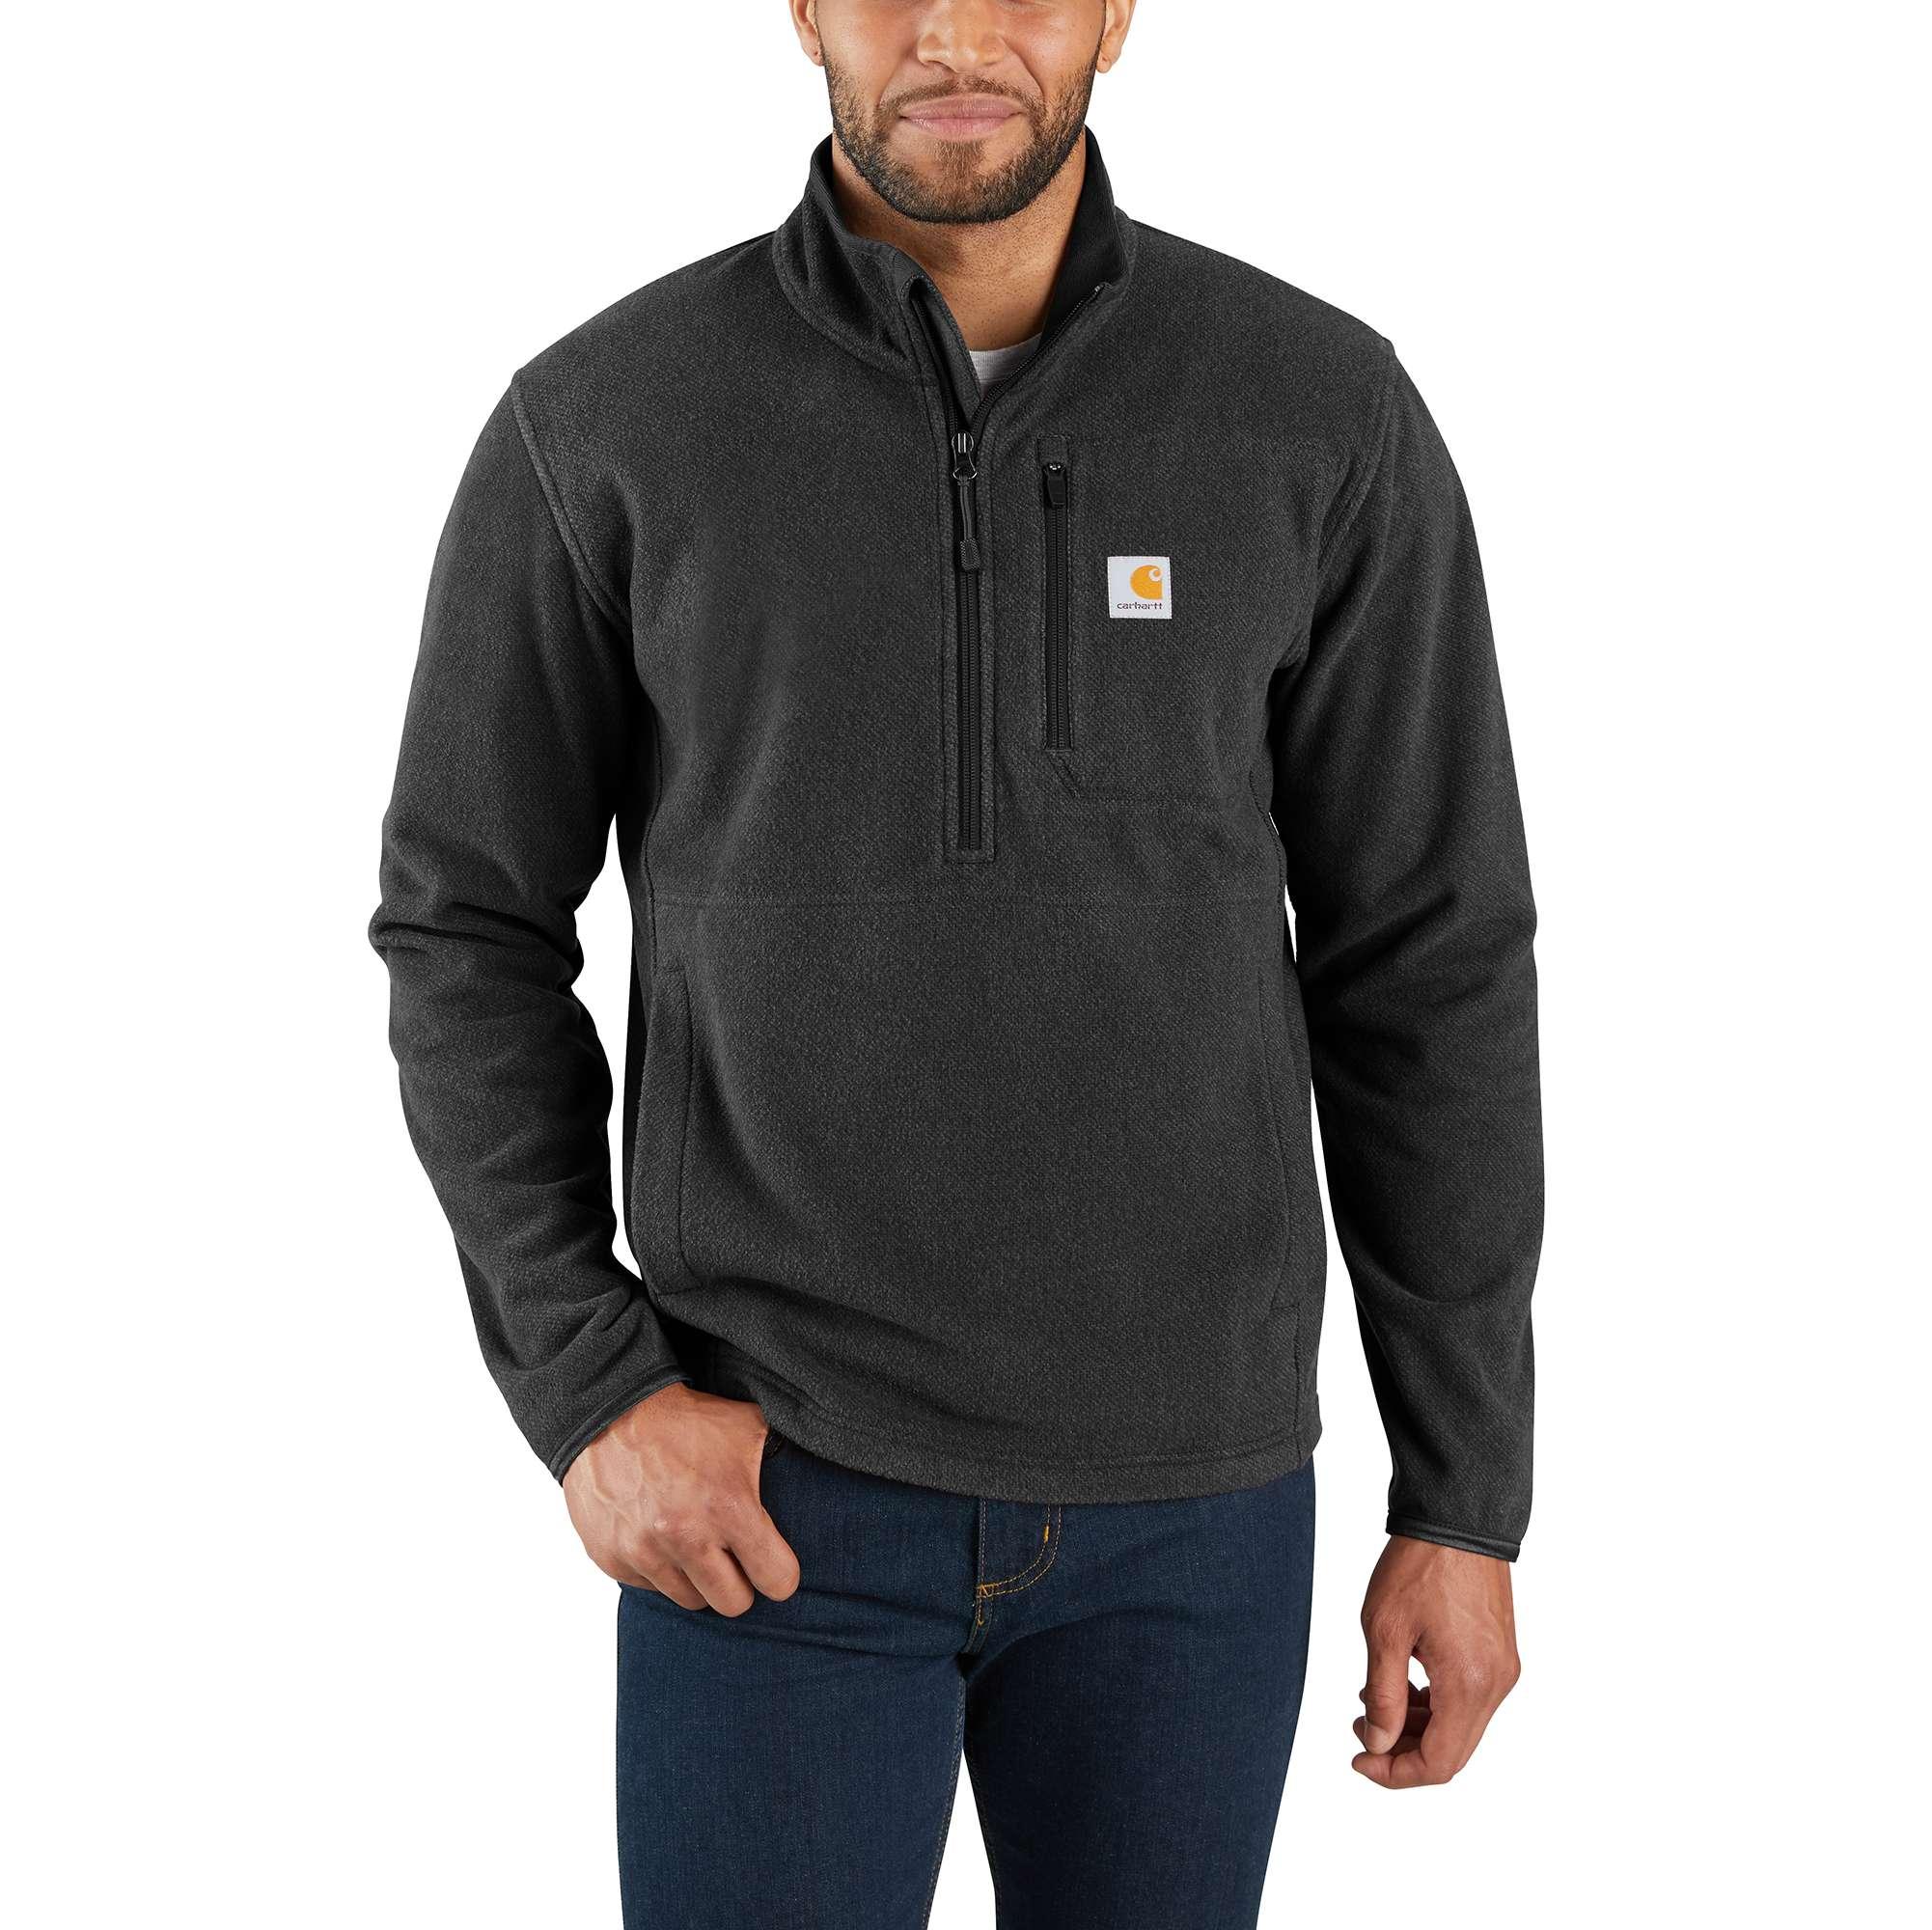 Dalton Half-Zip Fleece Jacket